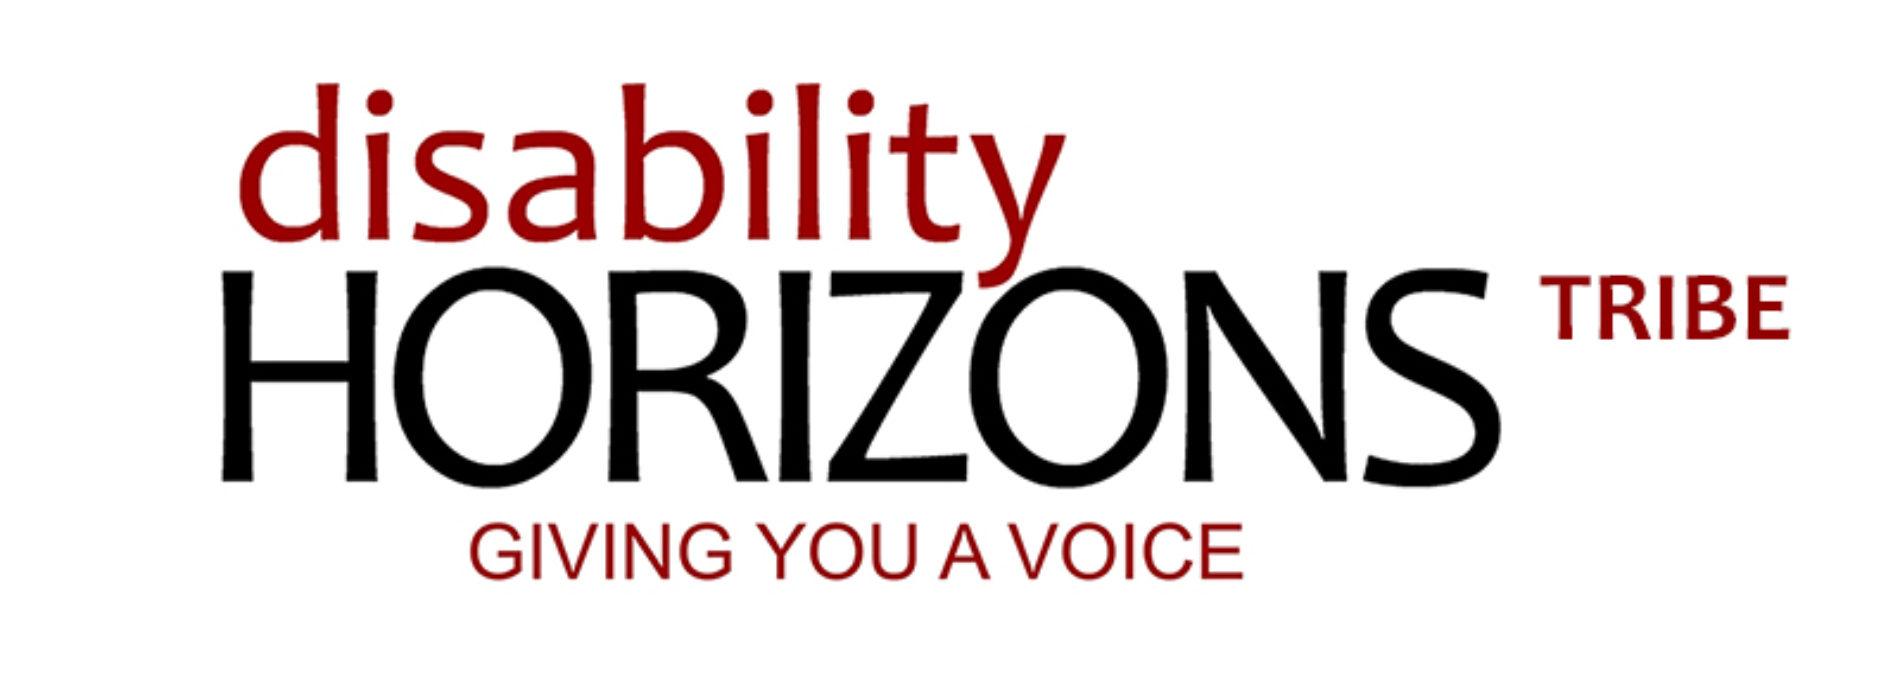 DHorizons Community